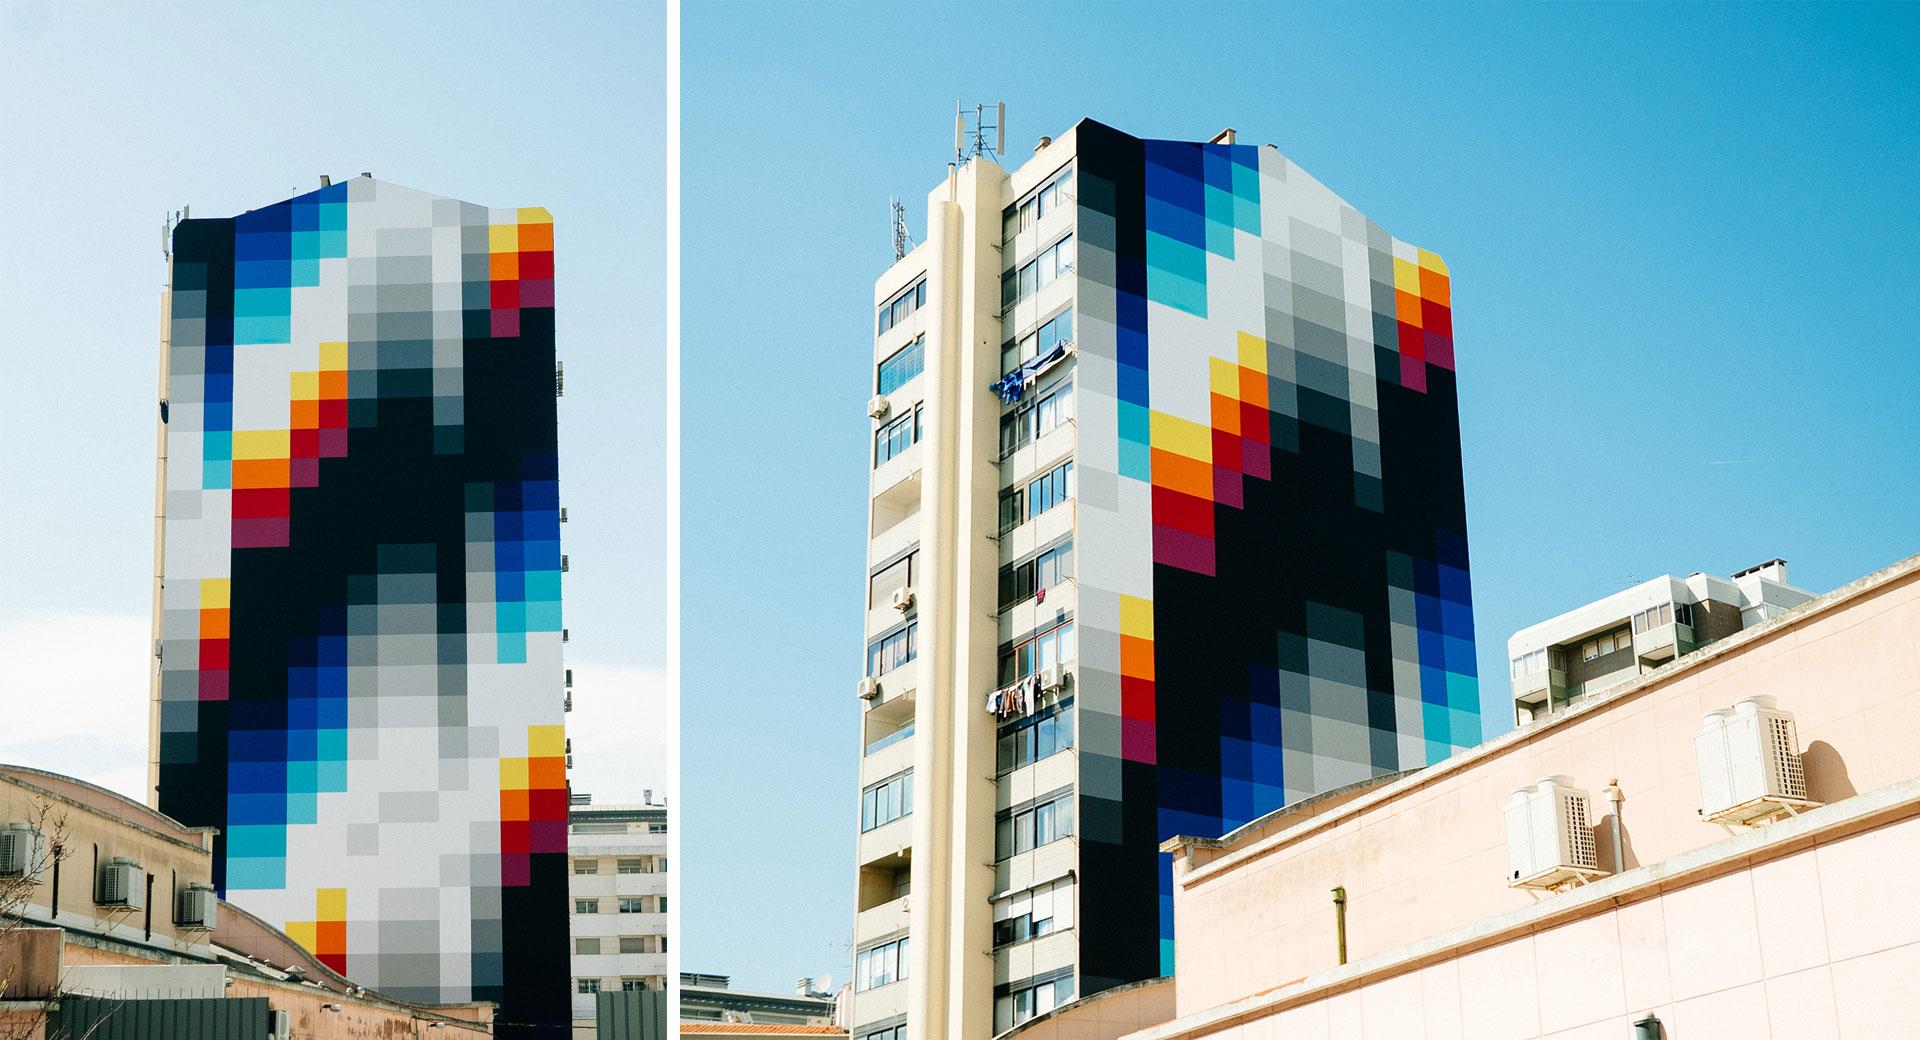 Biggest mural so far by Felipe Pantone in Lisbon Felipe Pantone